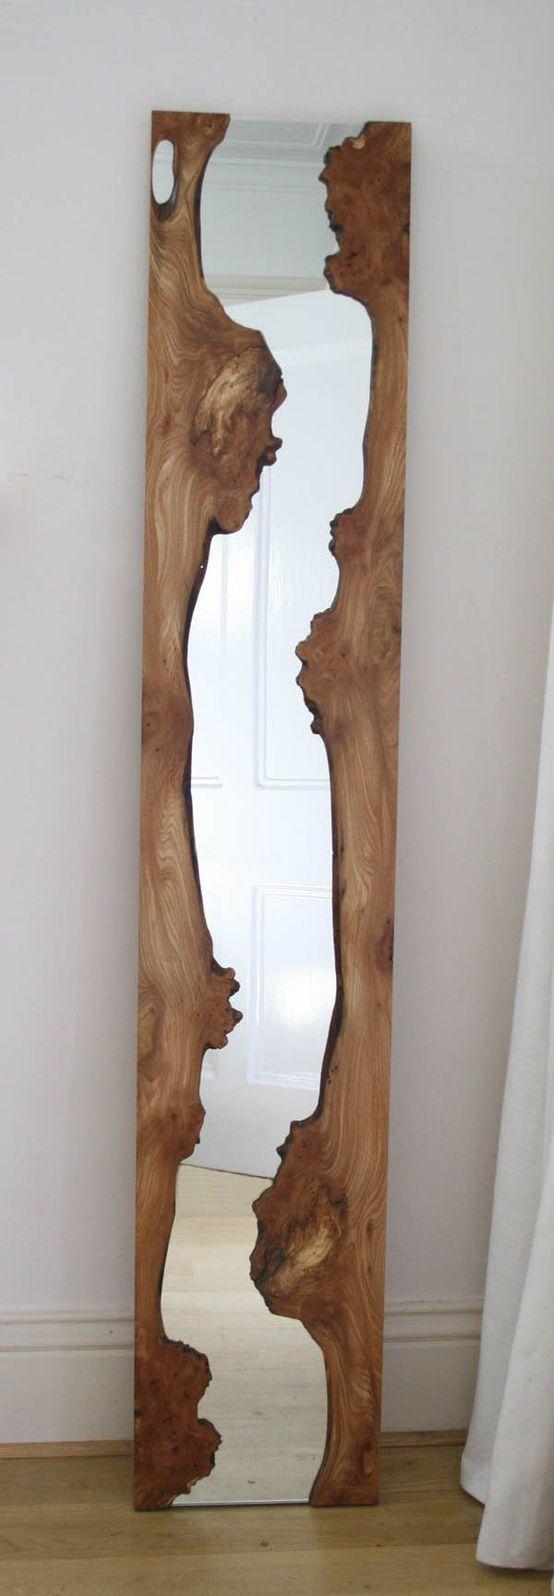 "Wood ""river"" mirror @ DIY Home Design"